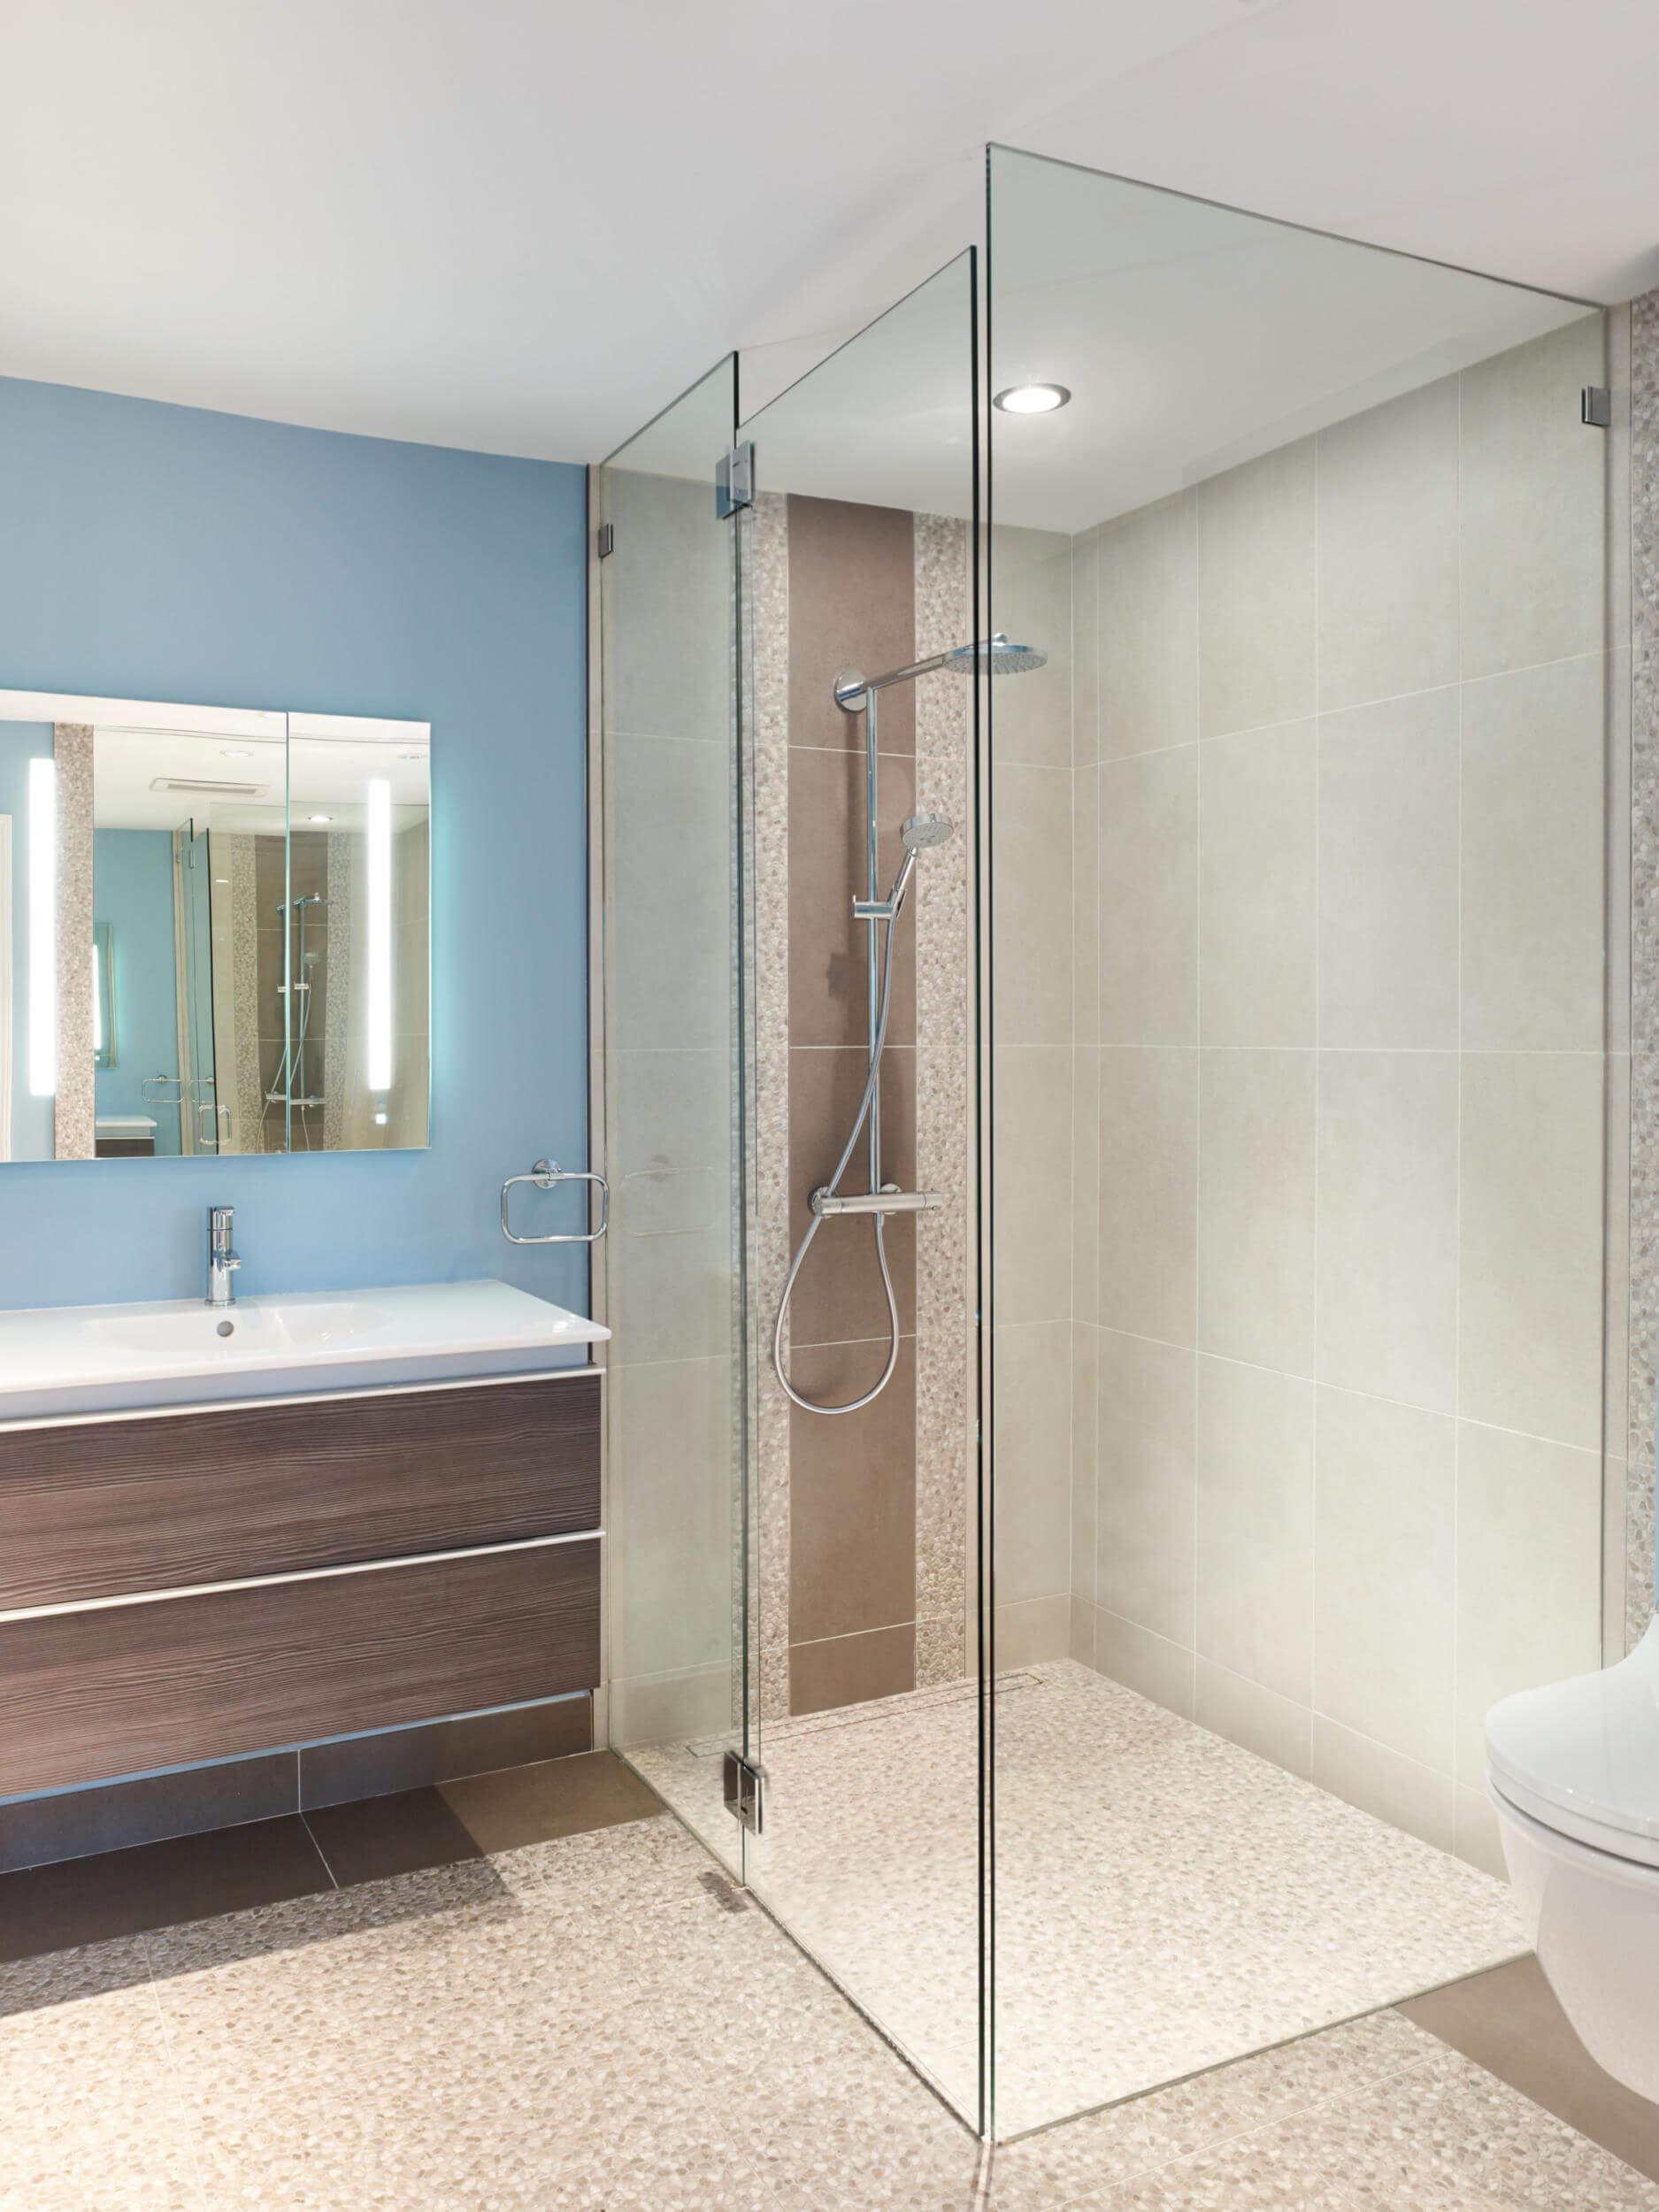 blau badezimmer - bathroom renovation - revision custom home, Badezimmer ideen